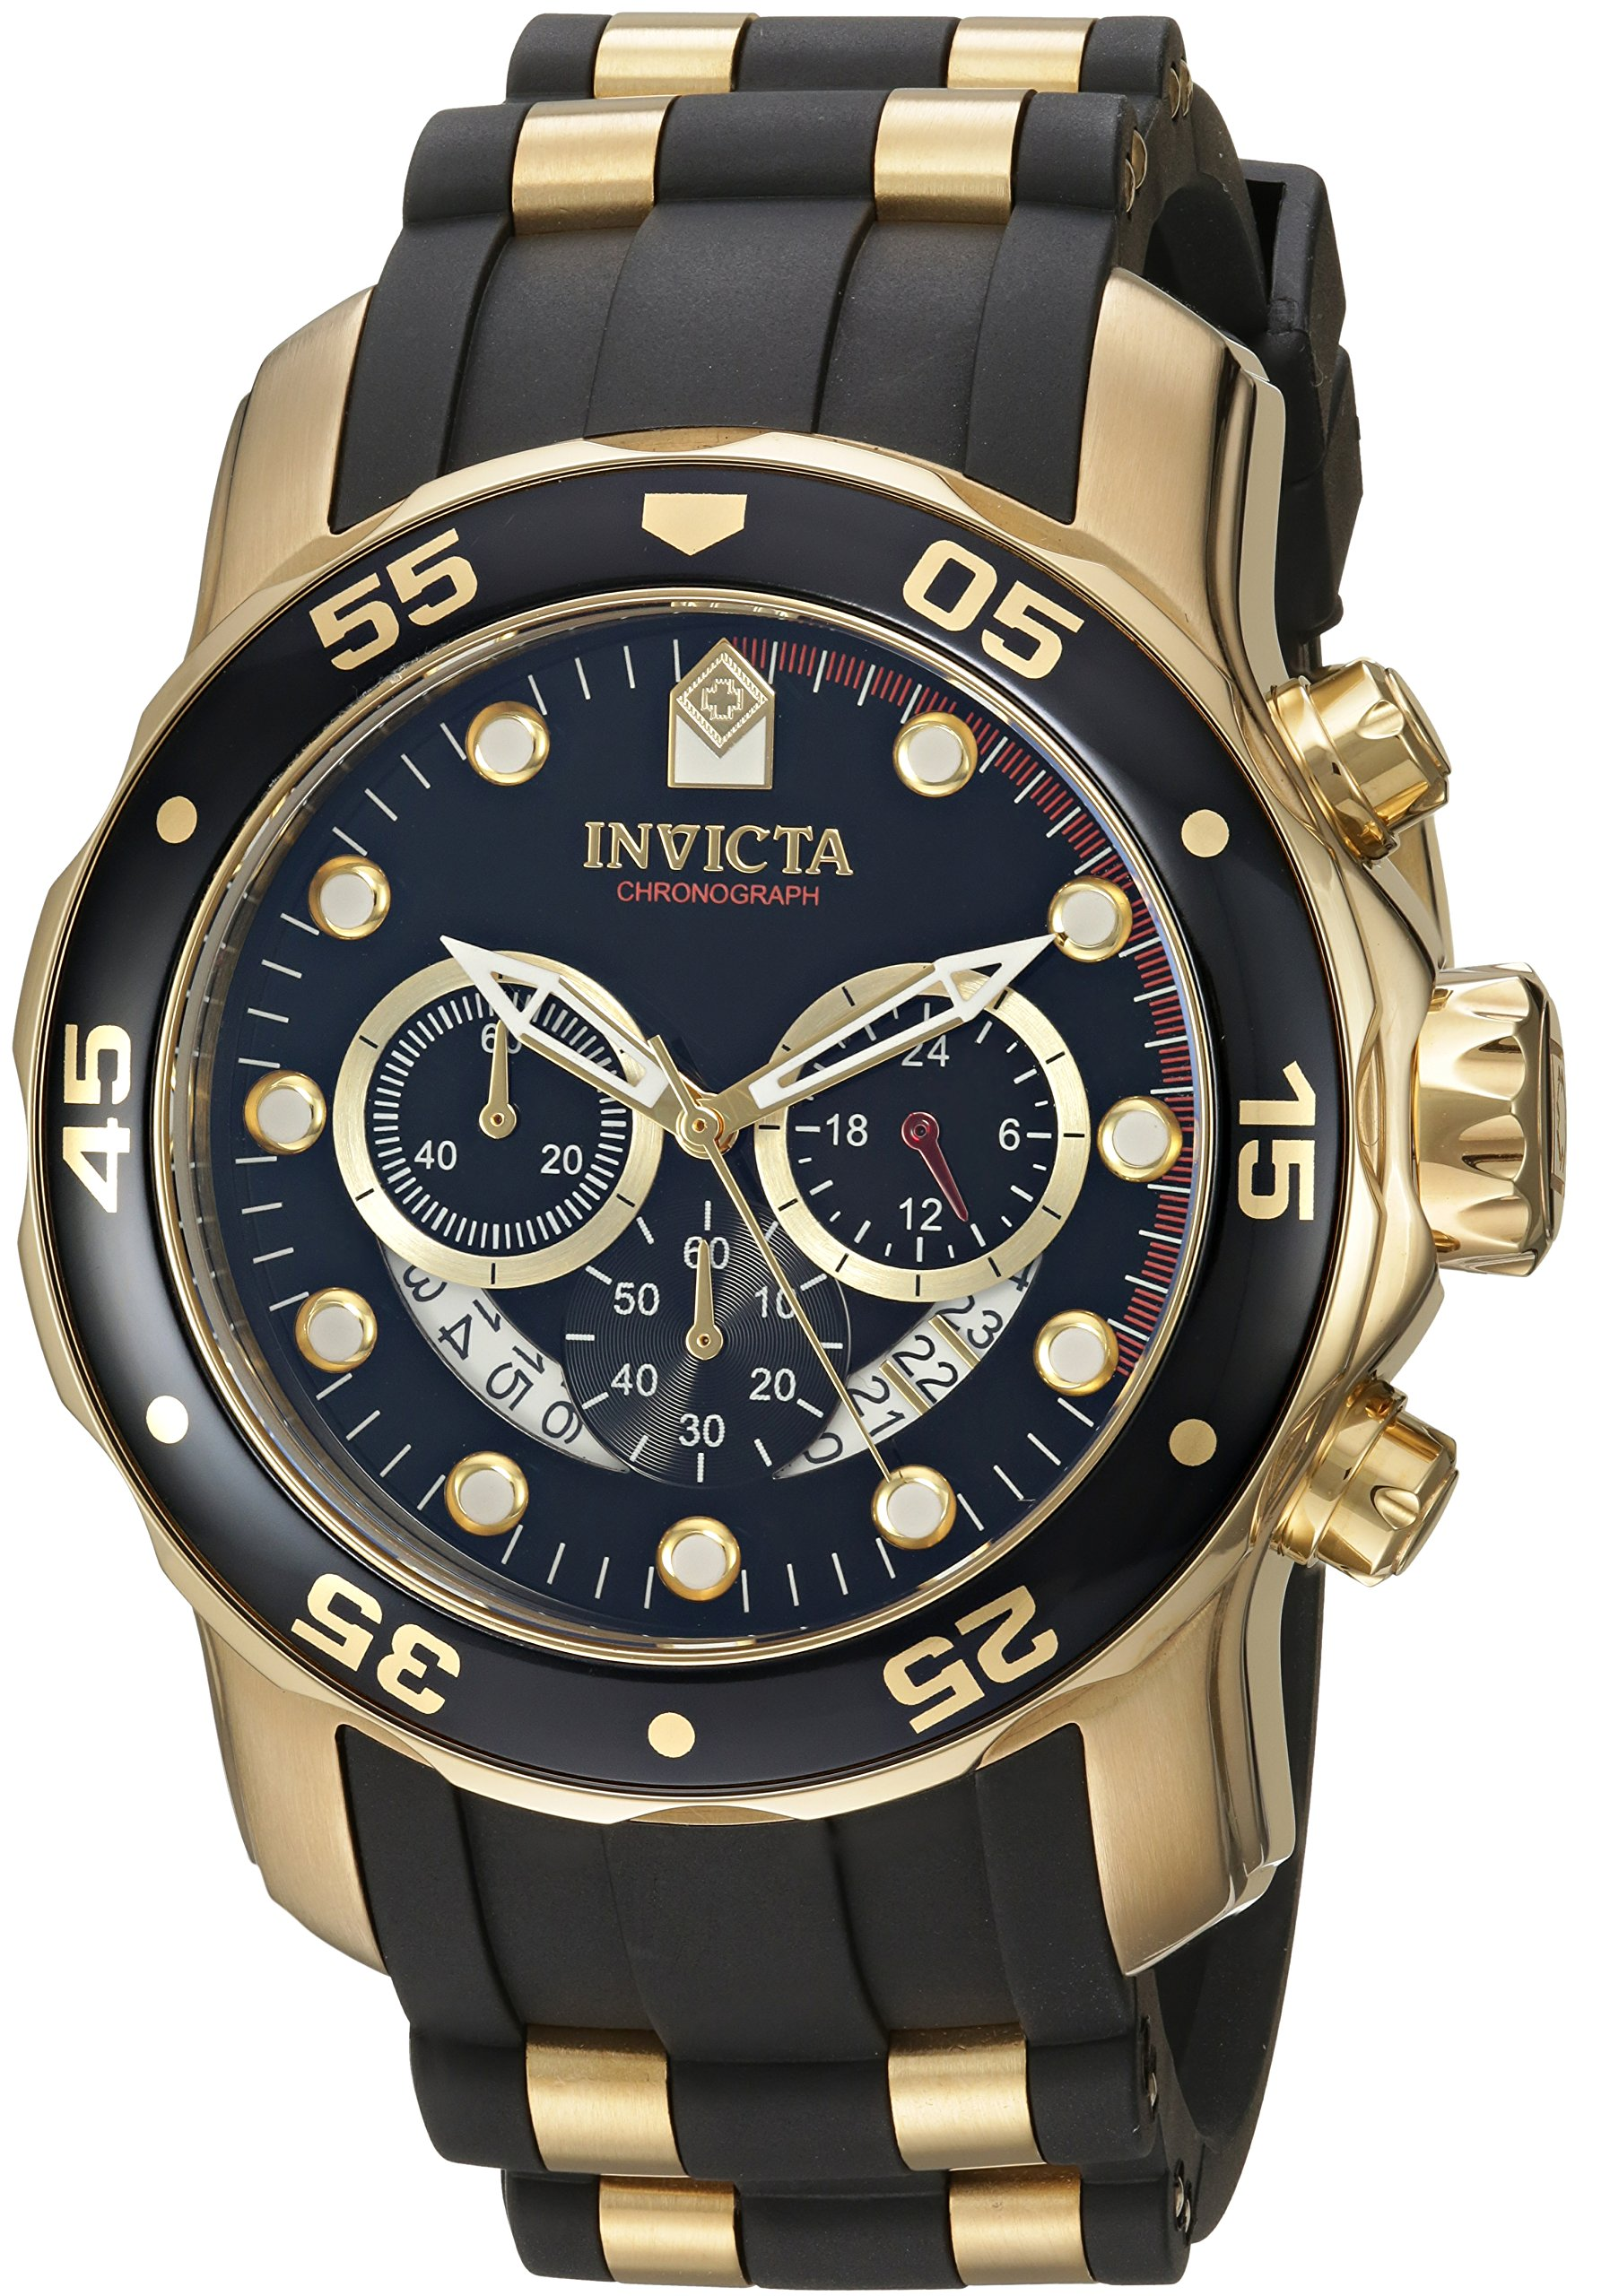 ad25876629f Original Invicta Men 6981 Pro Diver Analog Swiss Chronograph Black Gold  Watch